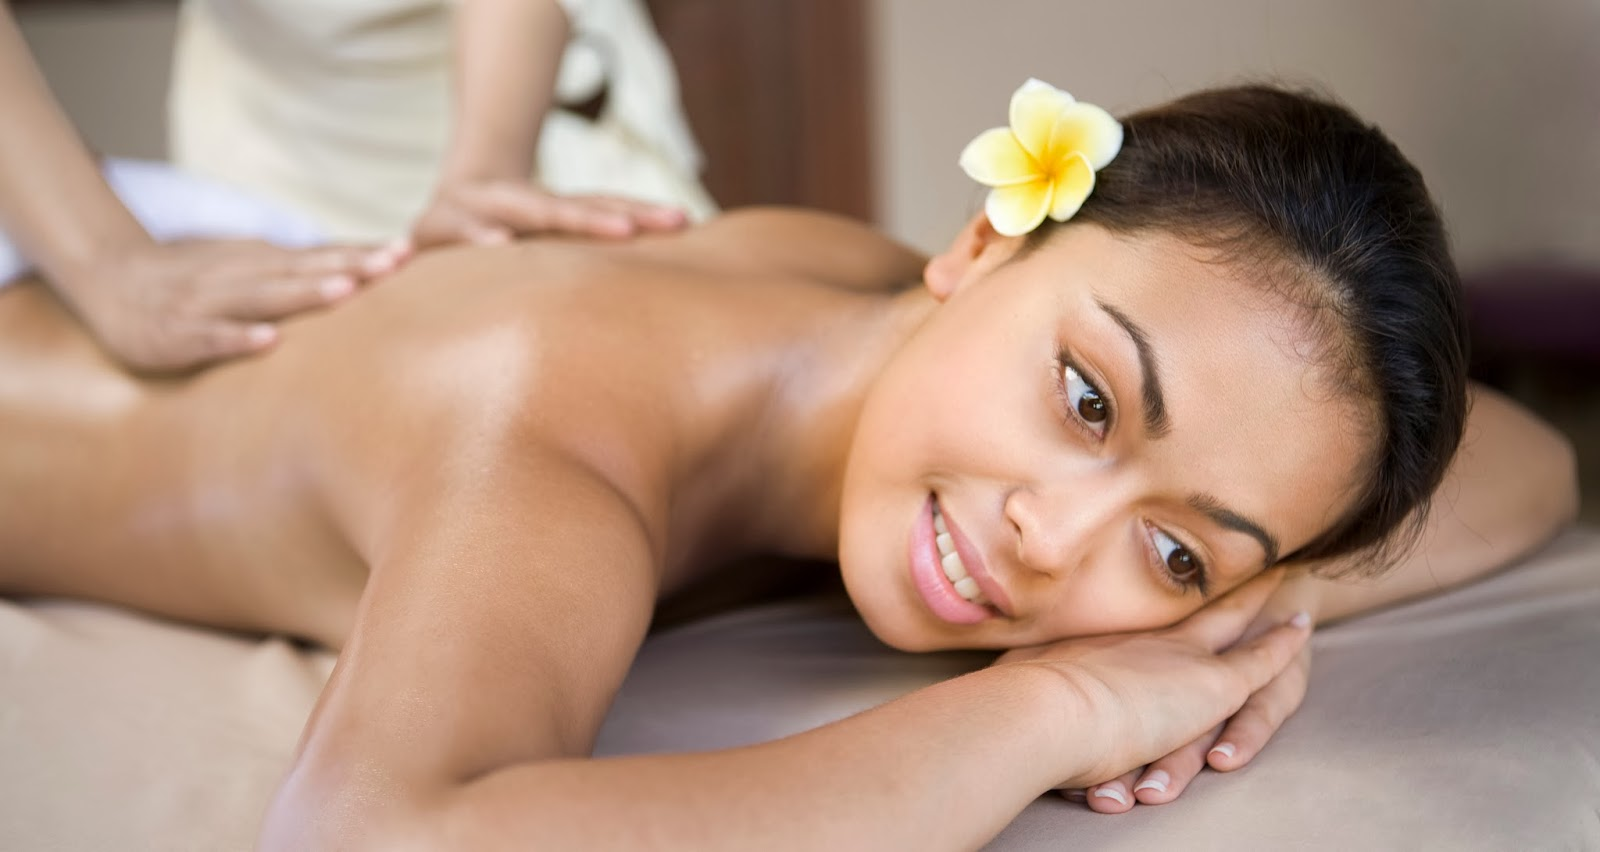 Видео мулатки массаж фото